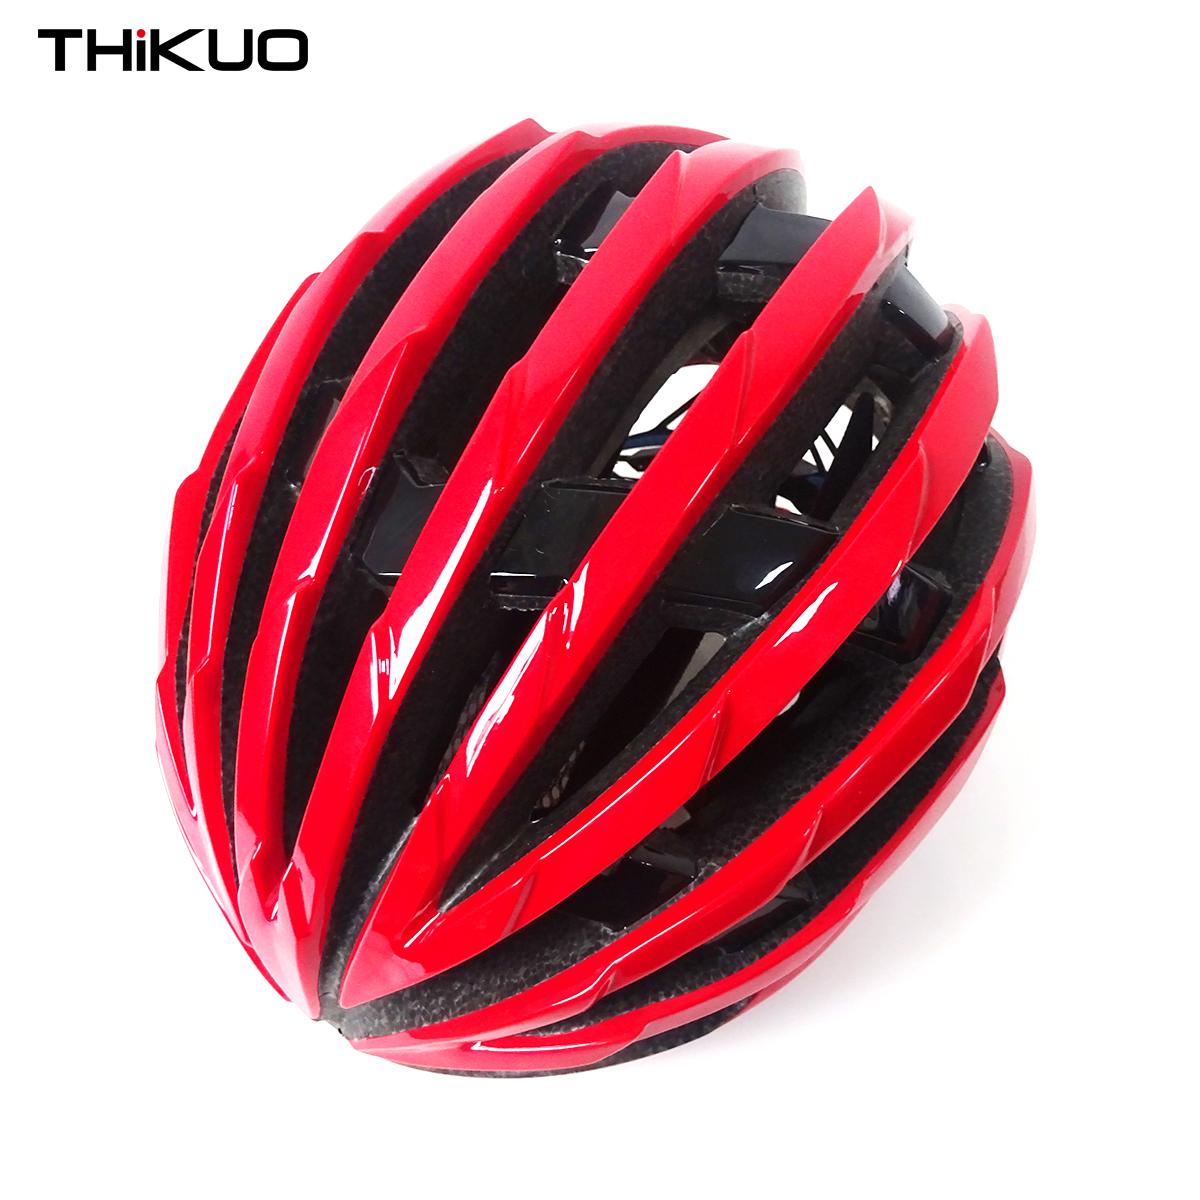 Hedgehog shape bicycle one-piece helmet light weight road bike wemen cycling helmets TH-760 3